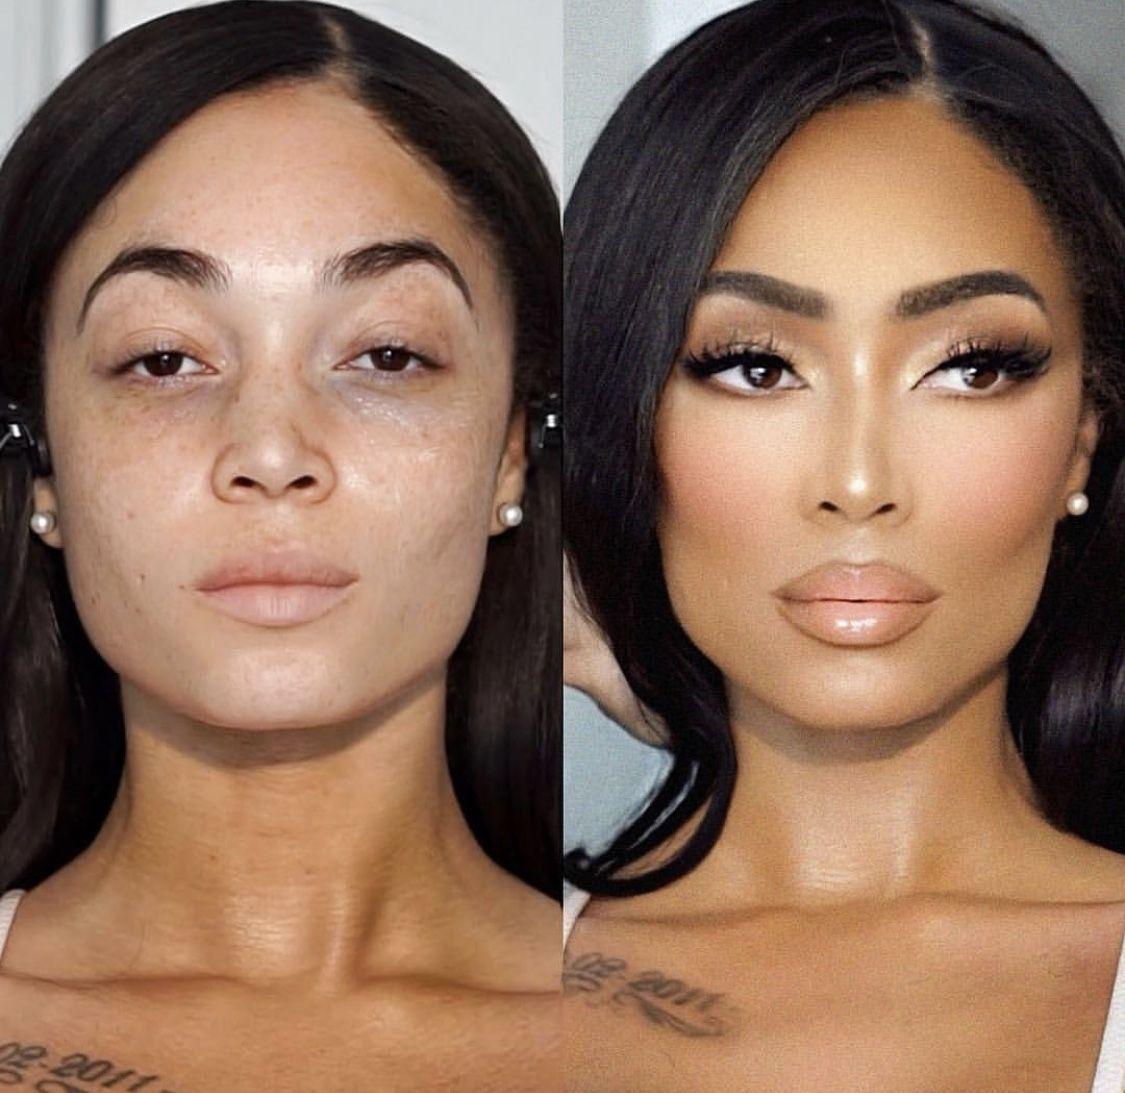 Face sculpting airbrush look neutral makeup